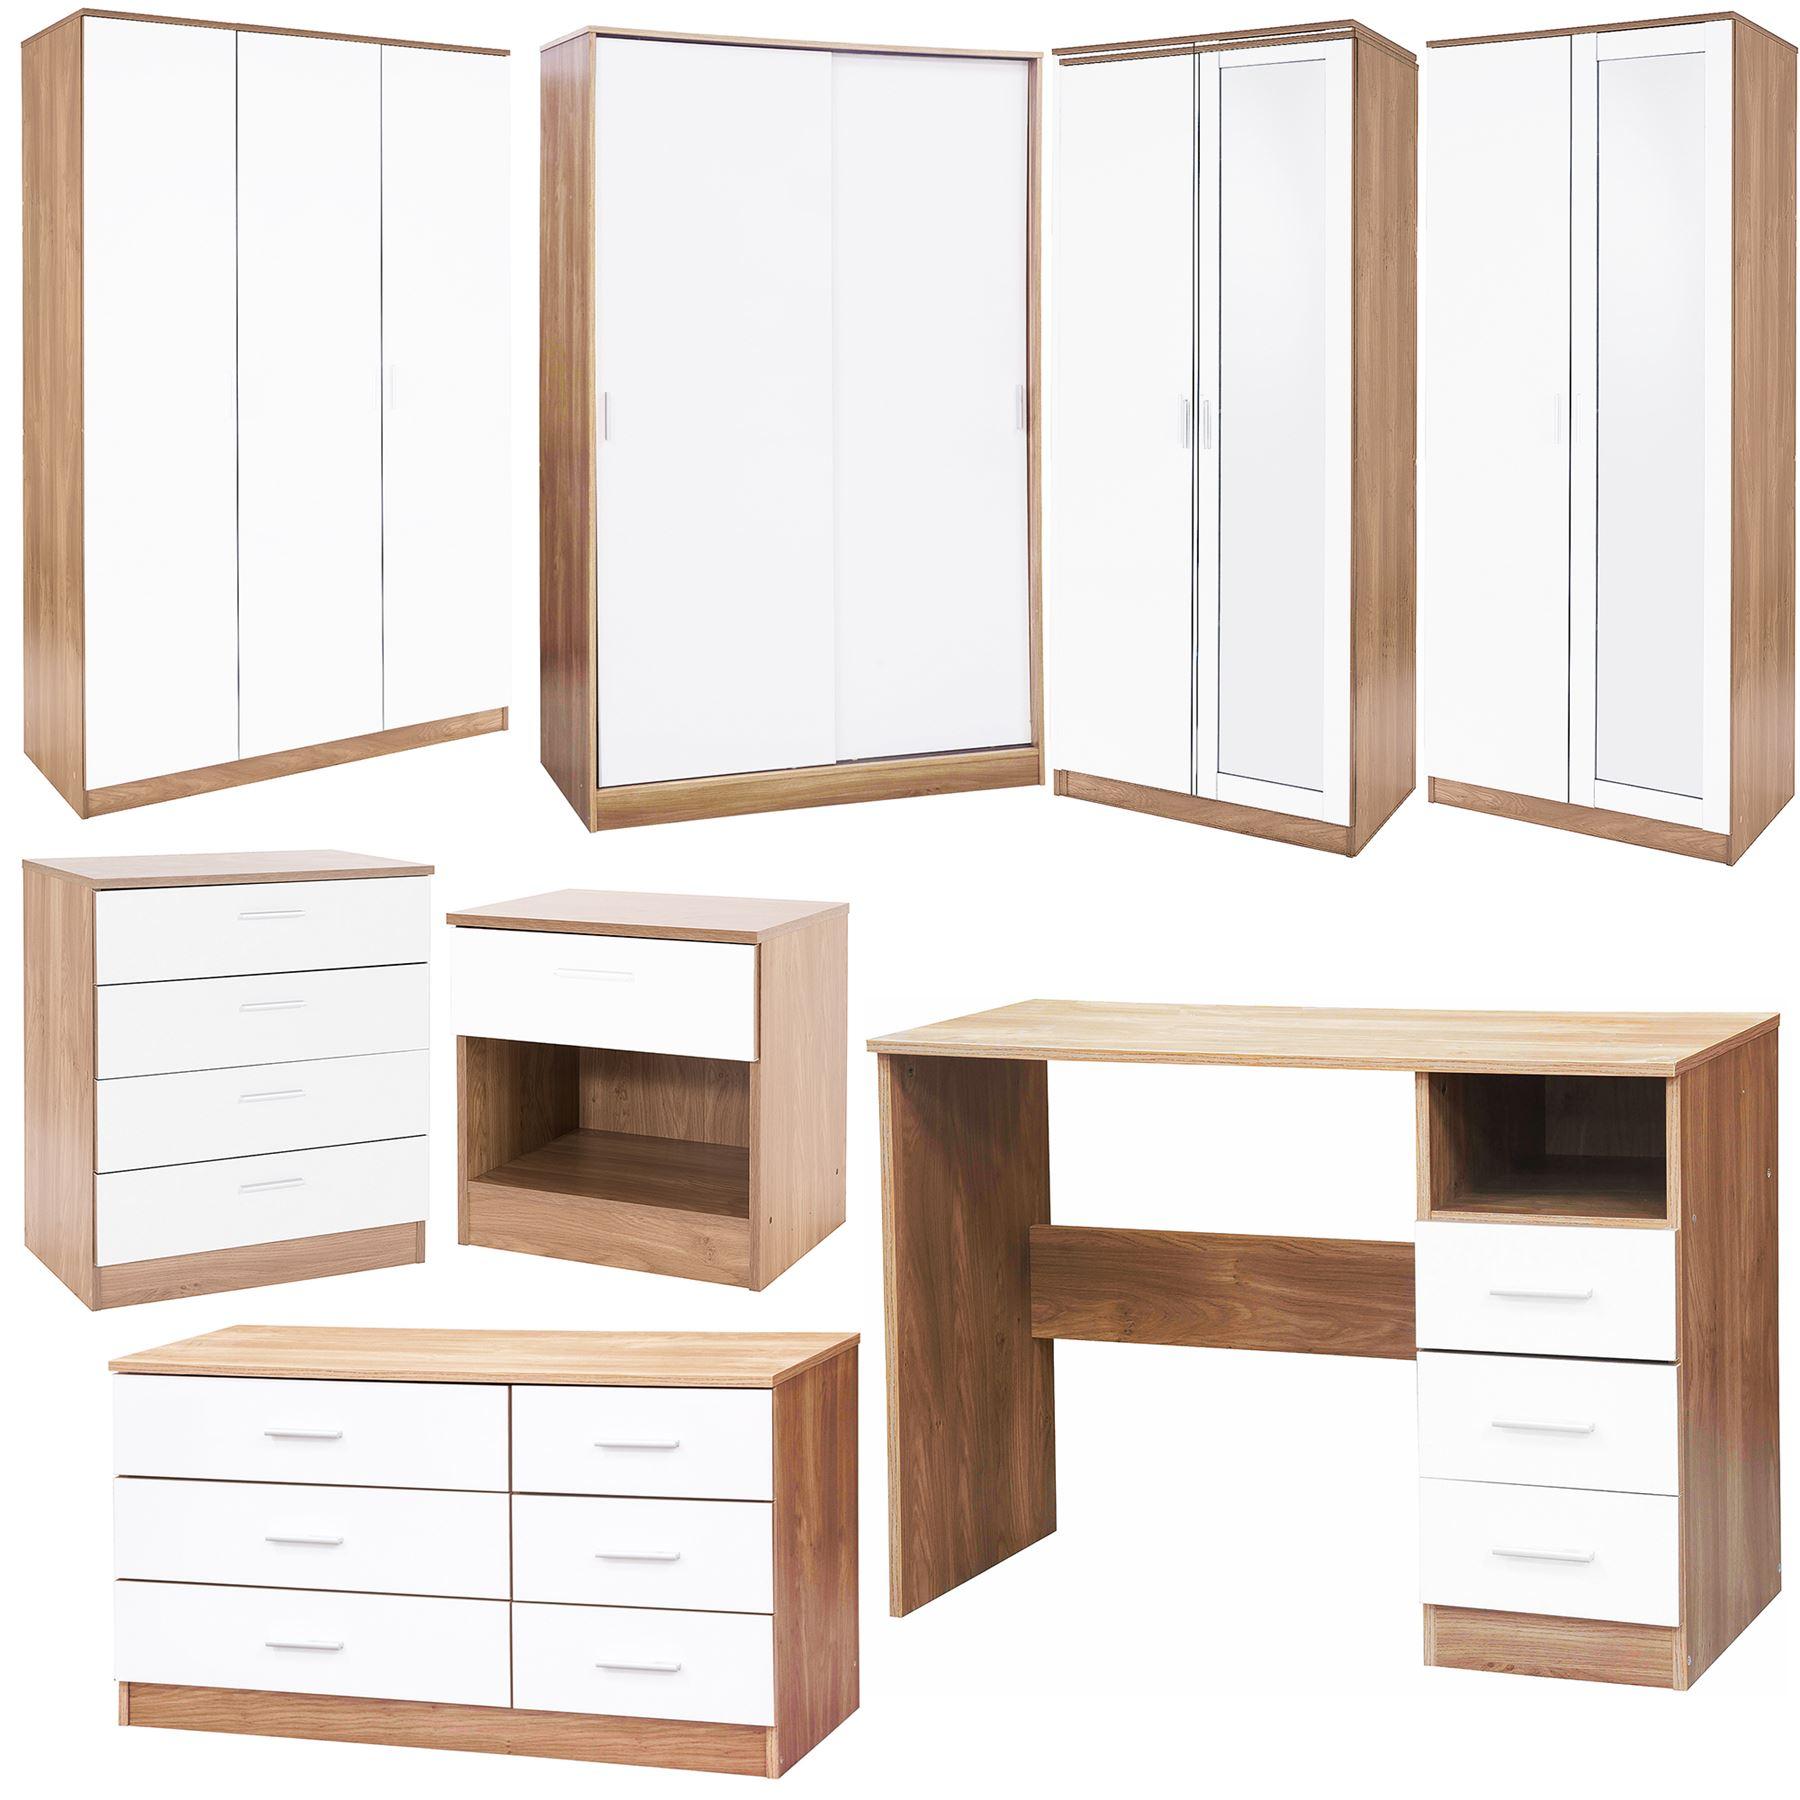 Details about BEDROOM FURNITURE 3 PIECE SET WHITE GLOSS & OAK DRAWER  BEDSIDE CHEST WARDROBE